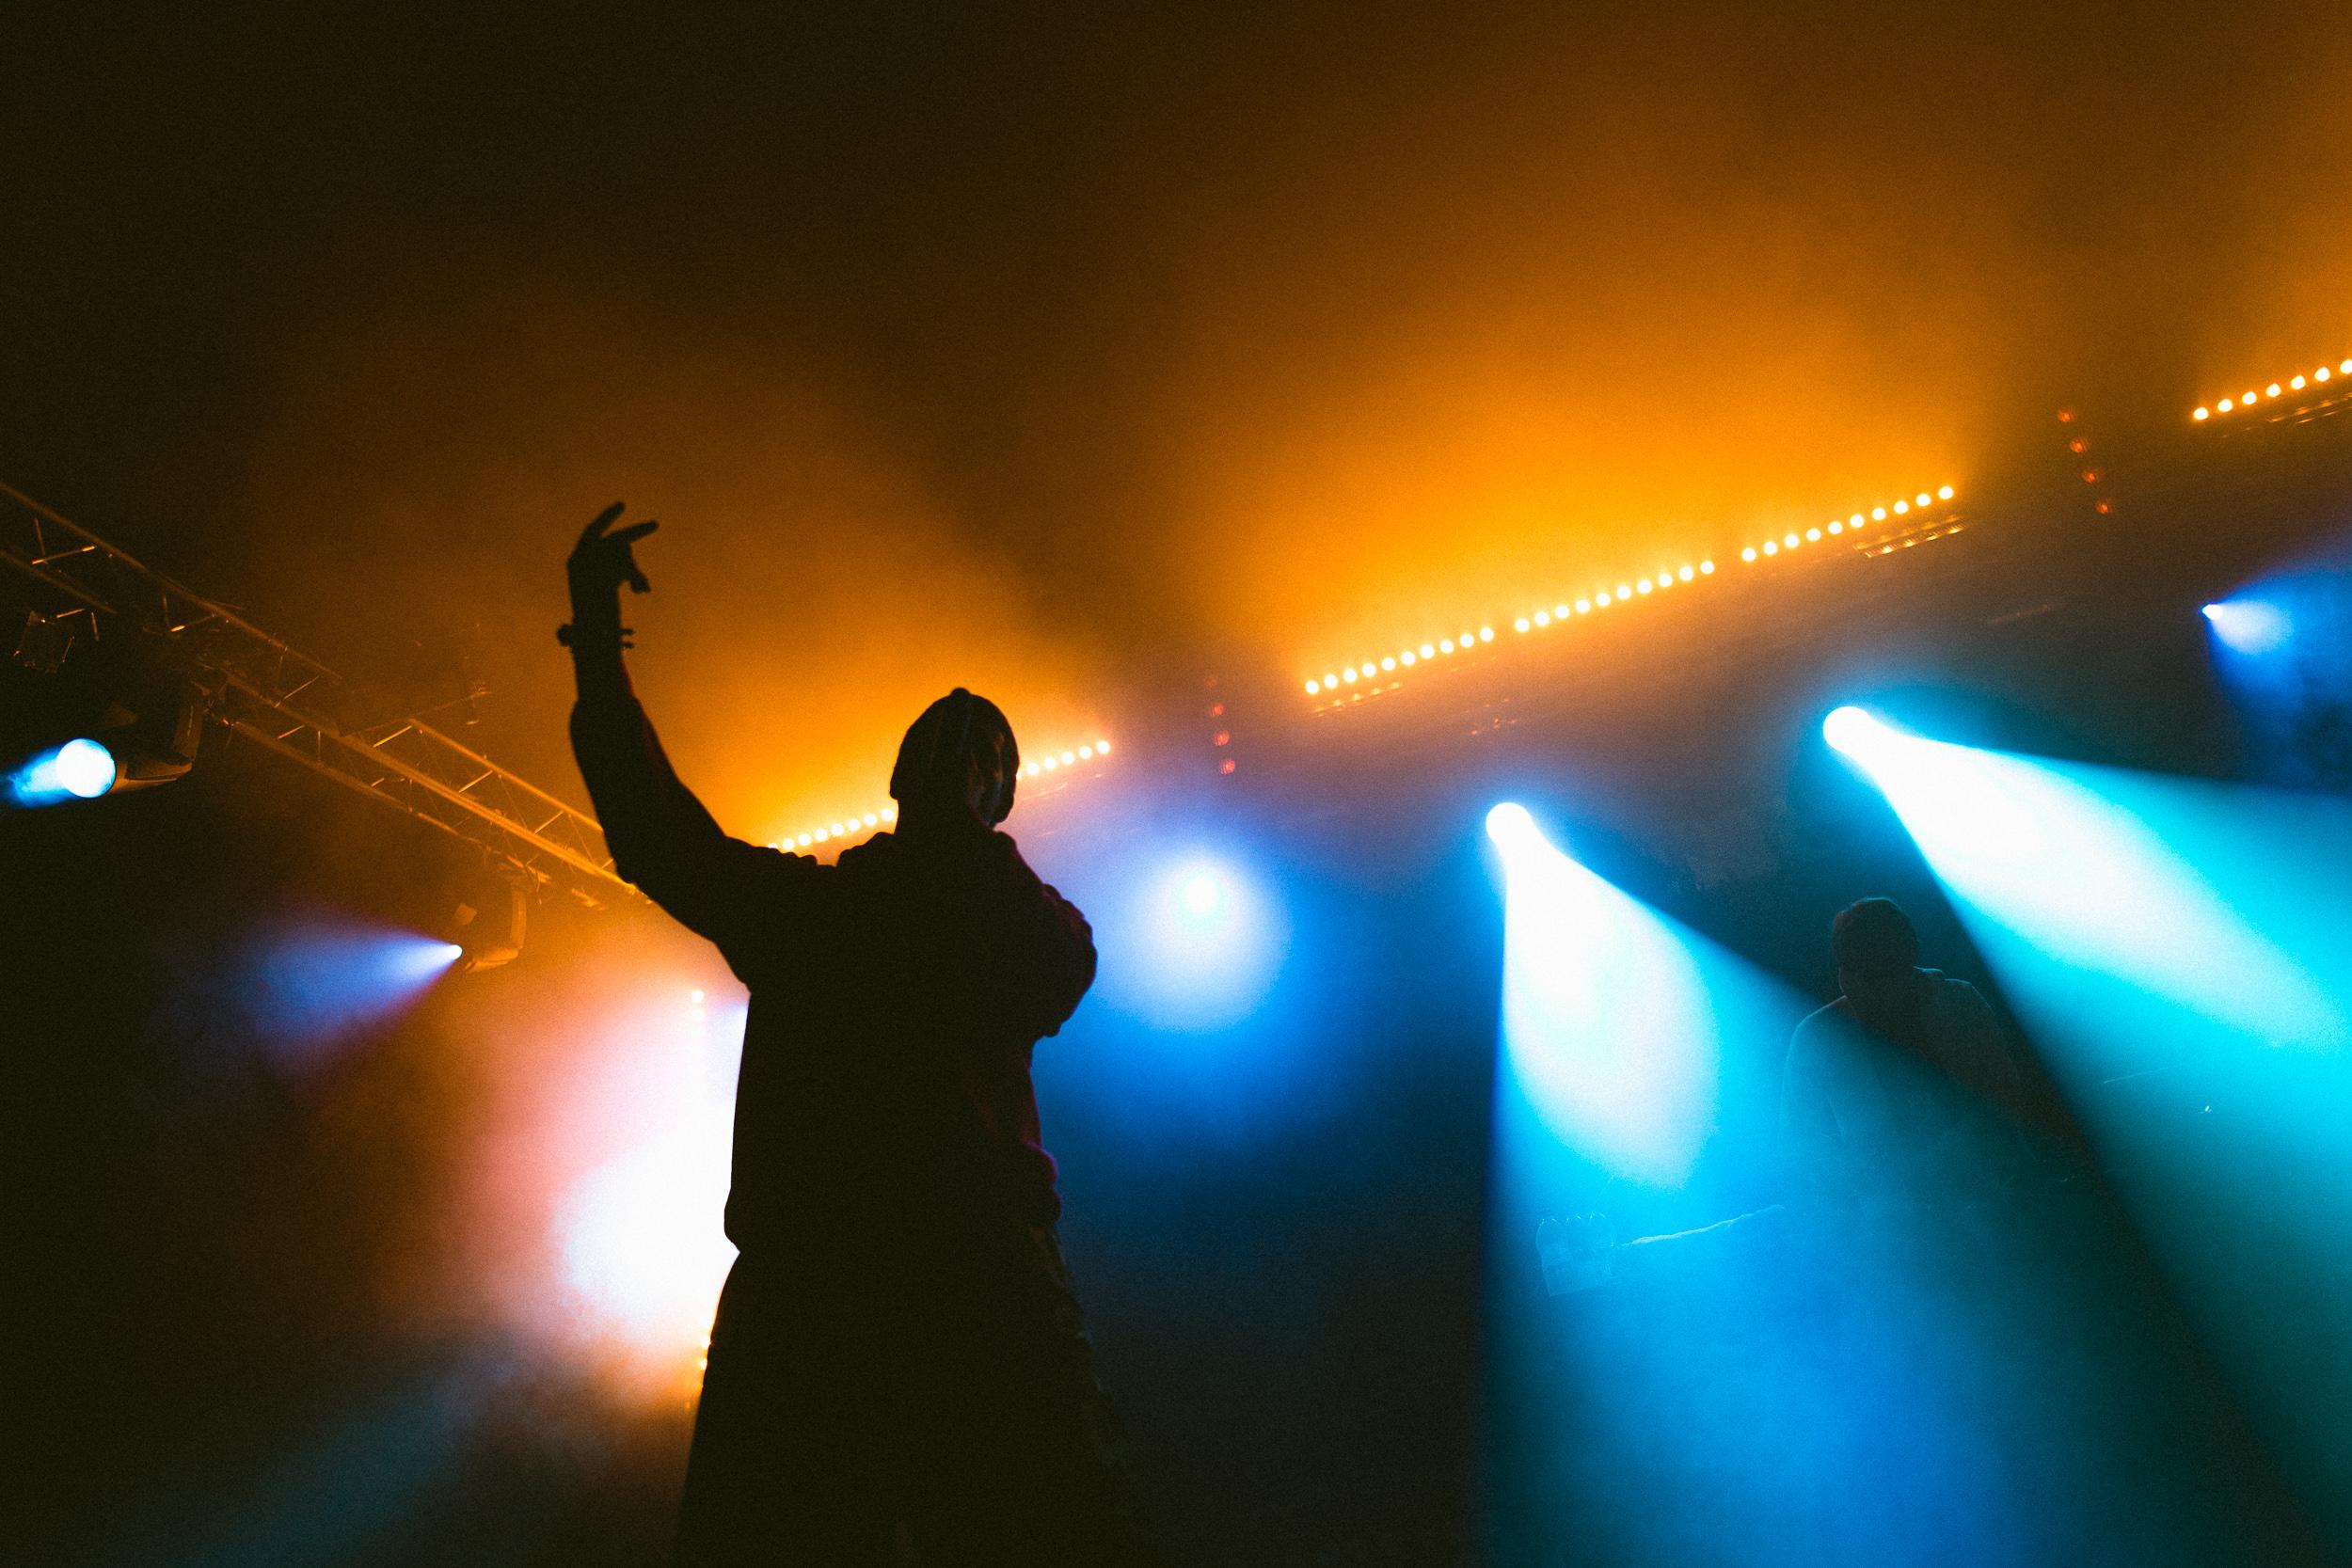 Yung Lean at Leeds Festival by Adam Elmakias